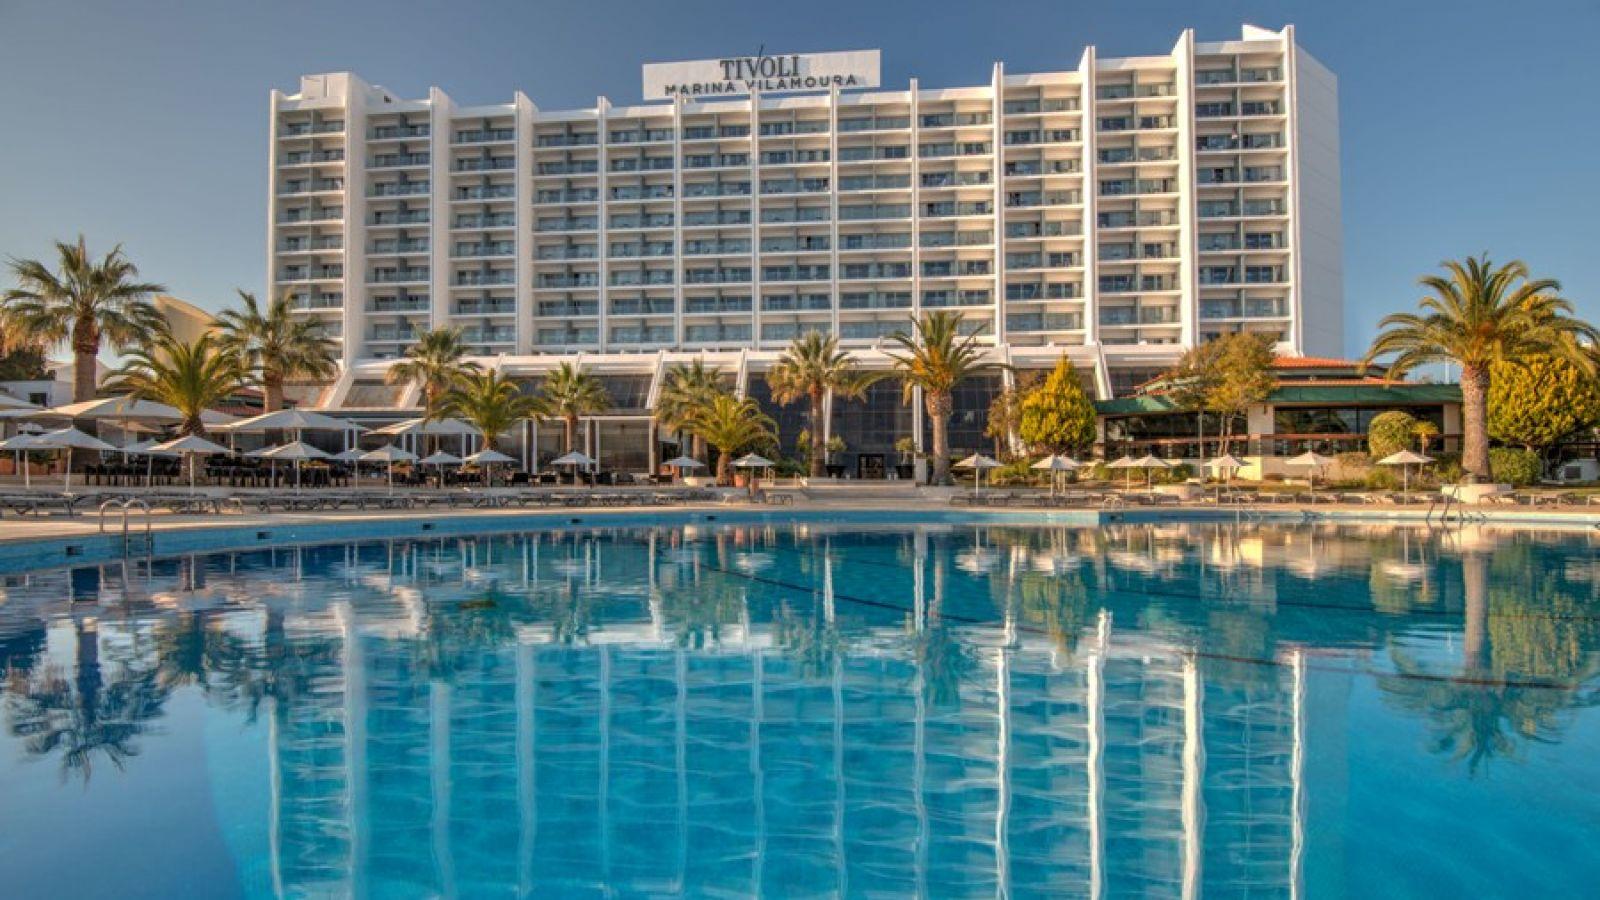 Tivoli Marina Hotel - Portugal golf packages